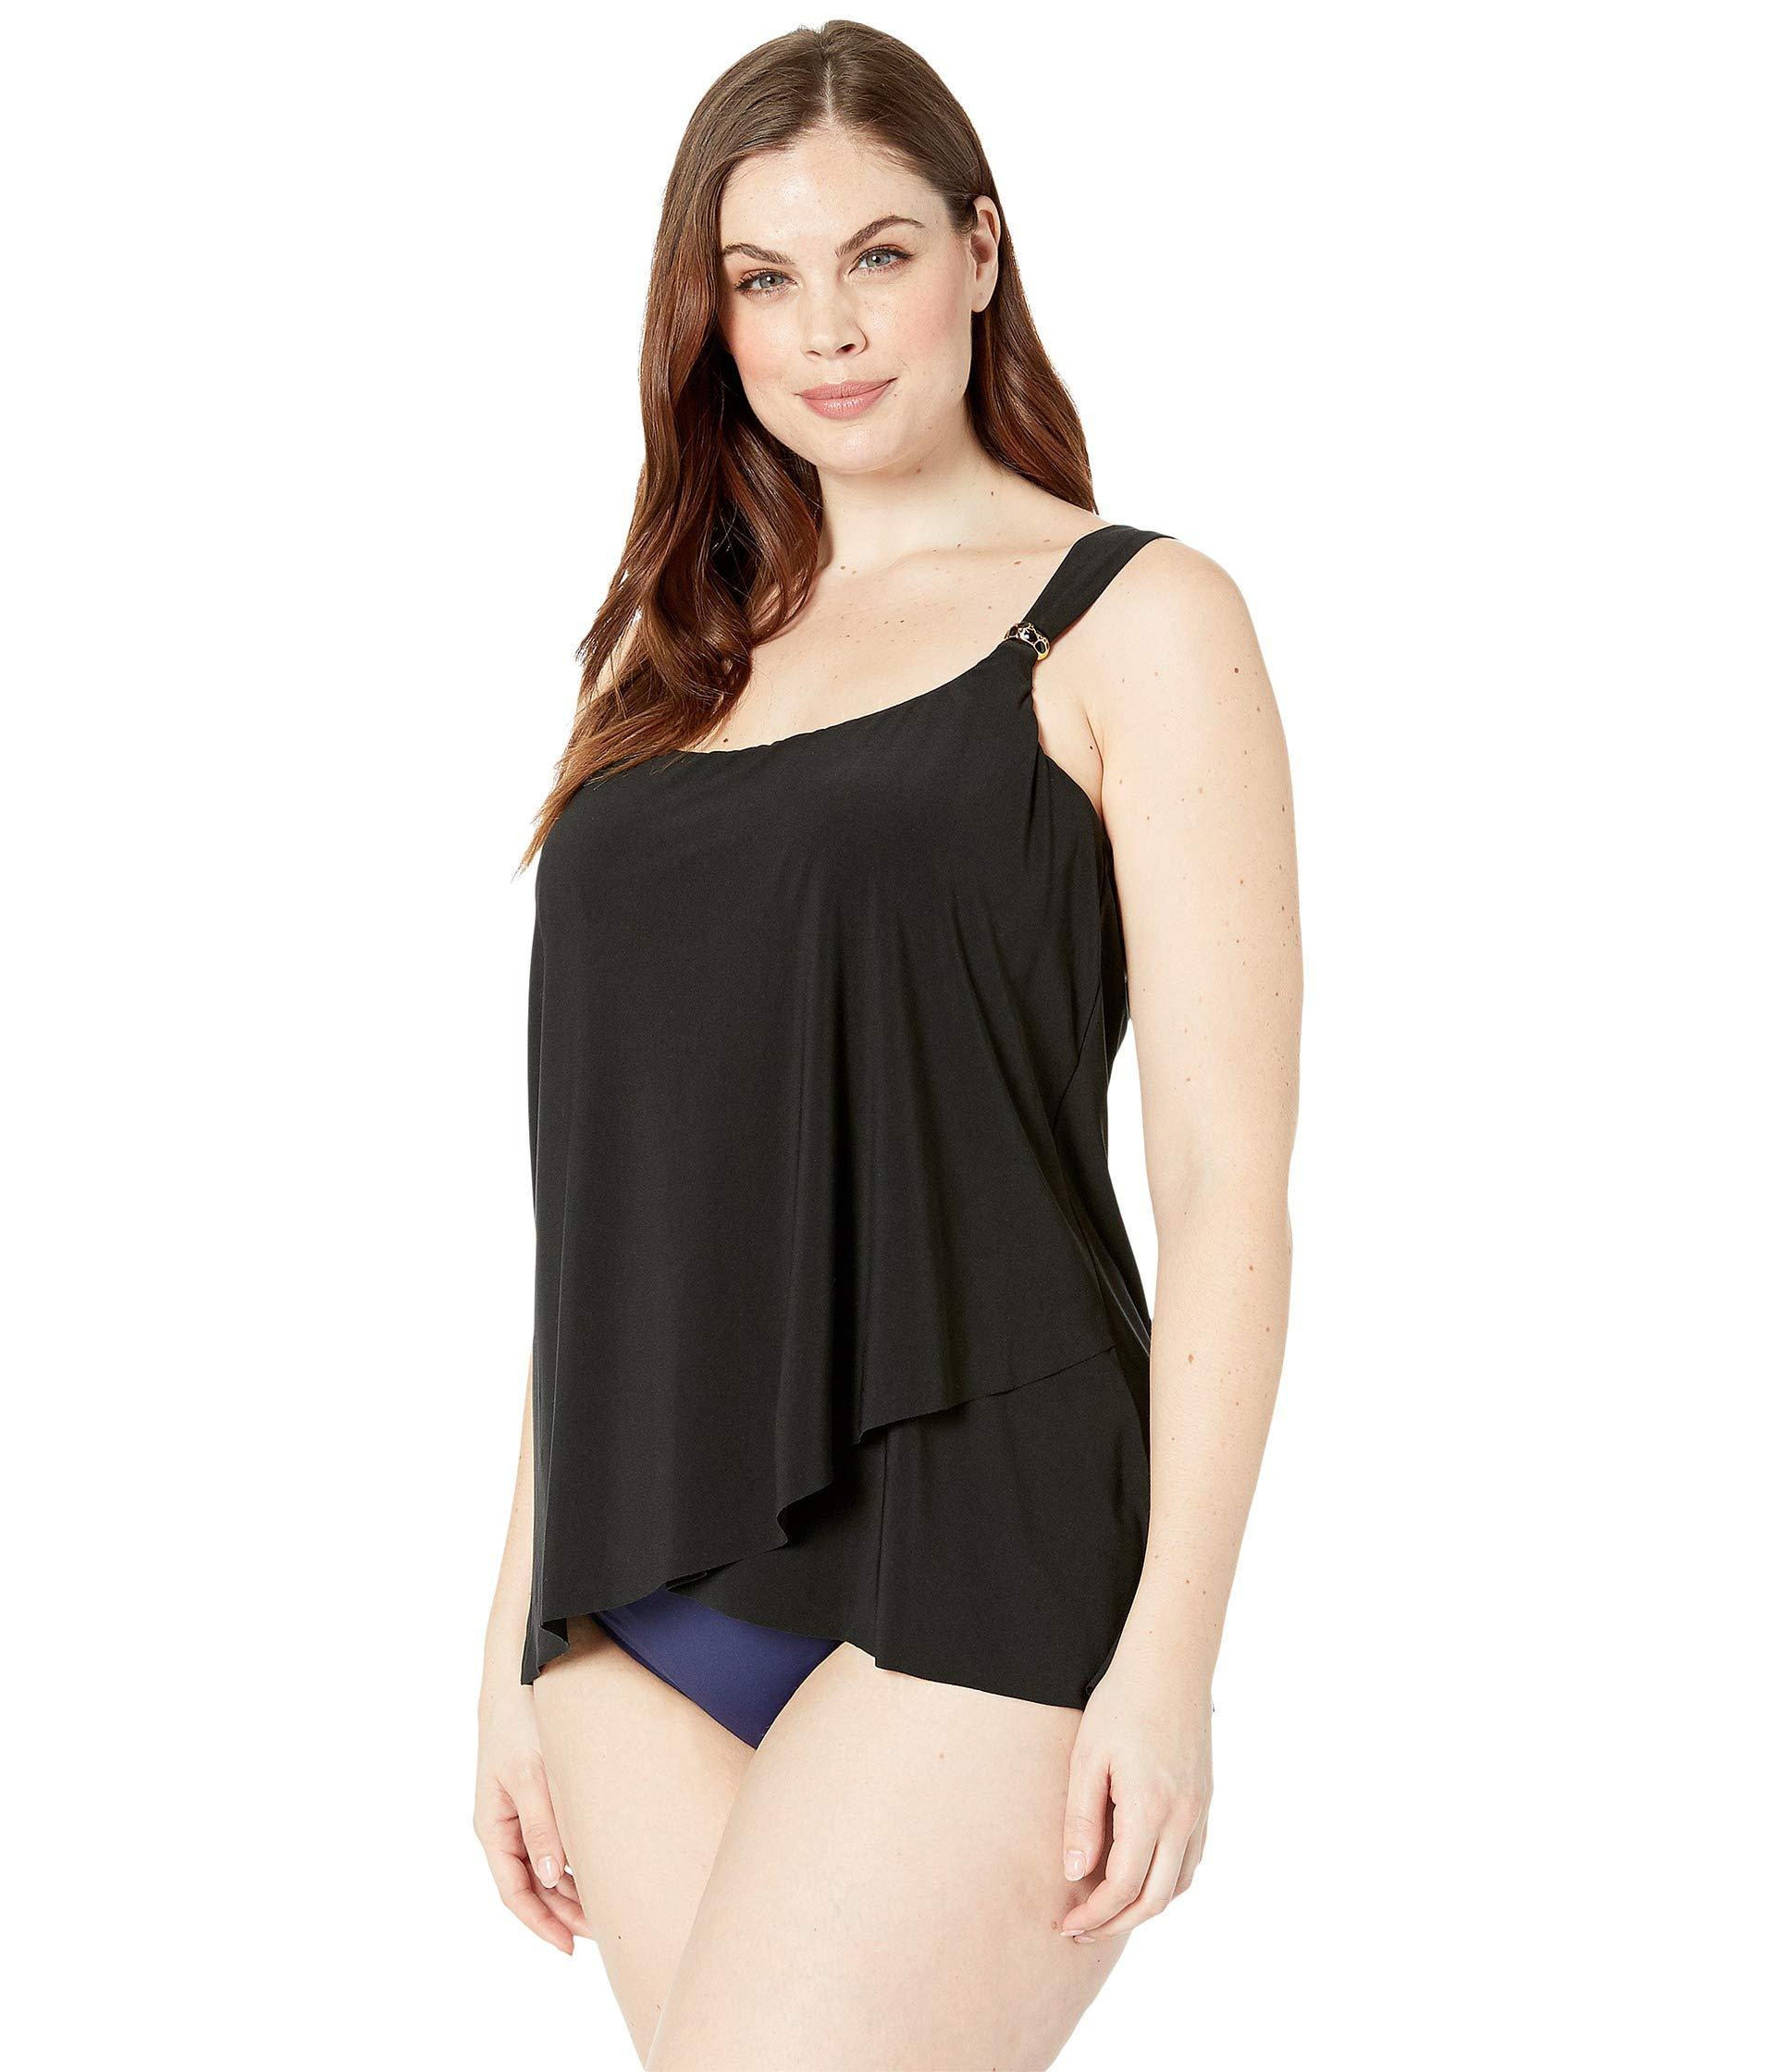 f9247fd729a5b Lyst - Miraclesuit Plus Size Solid Dazzle Tankini Top (black) Women's  Swimwear in Black